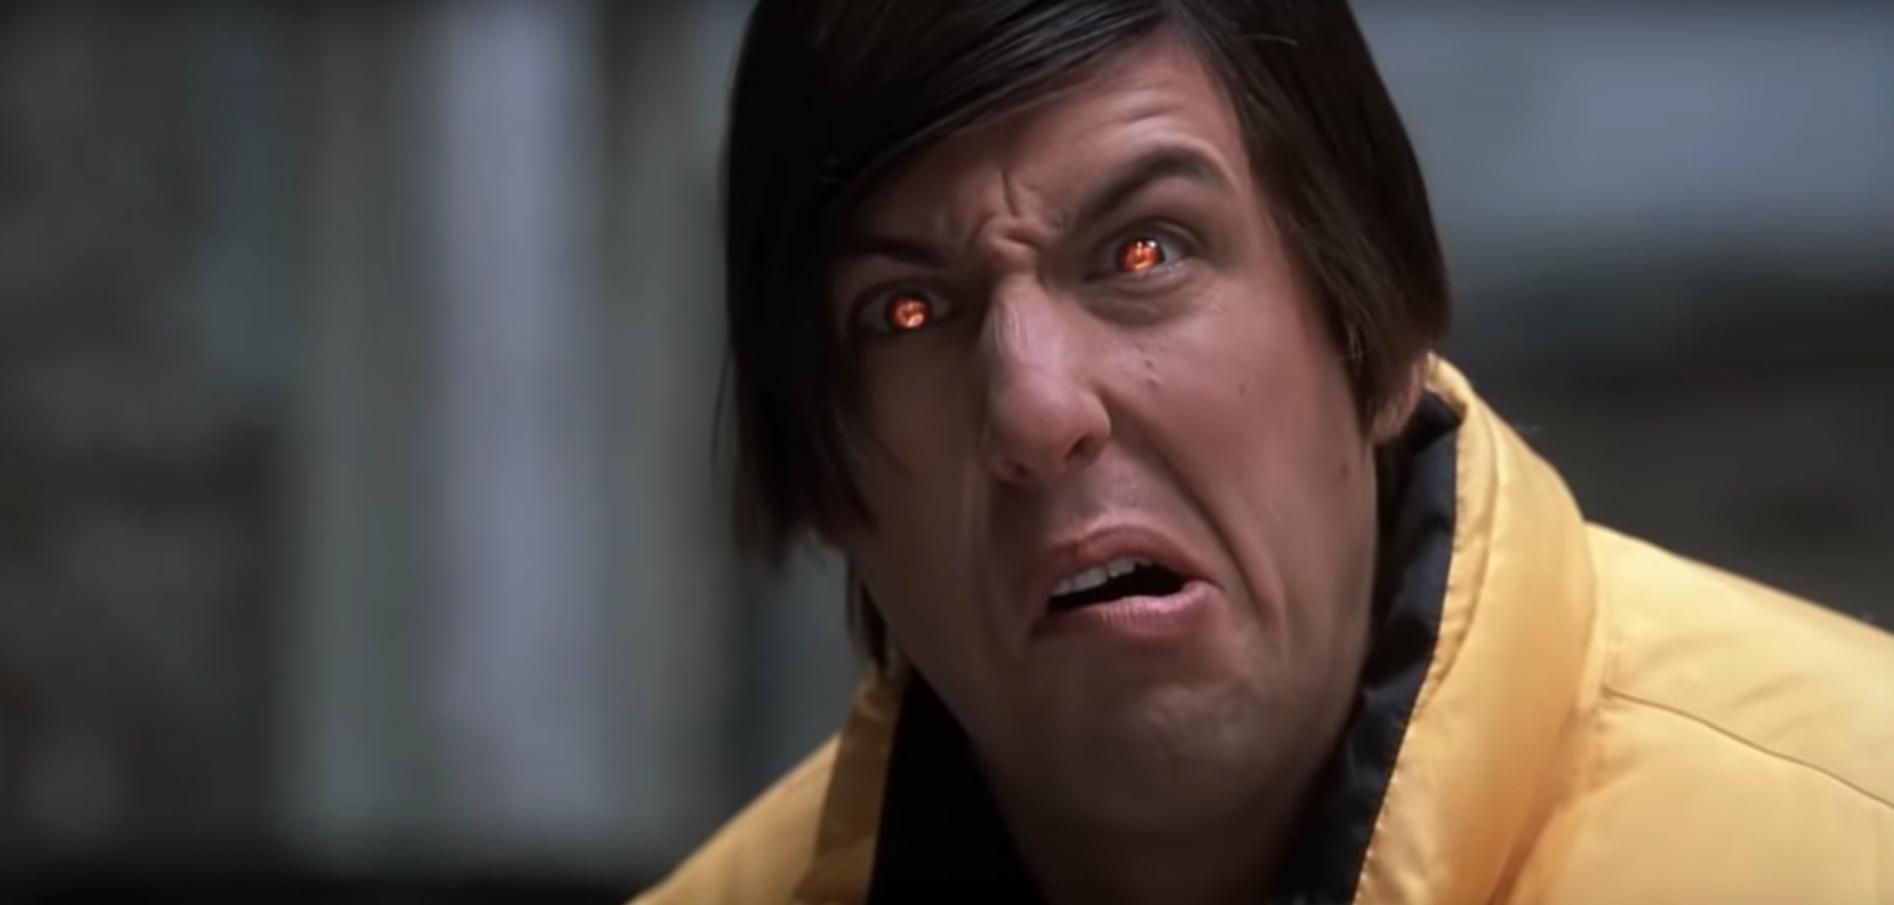 Little Nicky Top 10 Demonic Movies